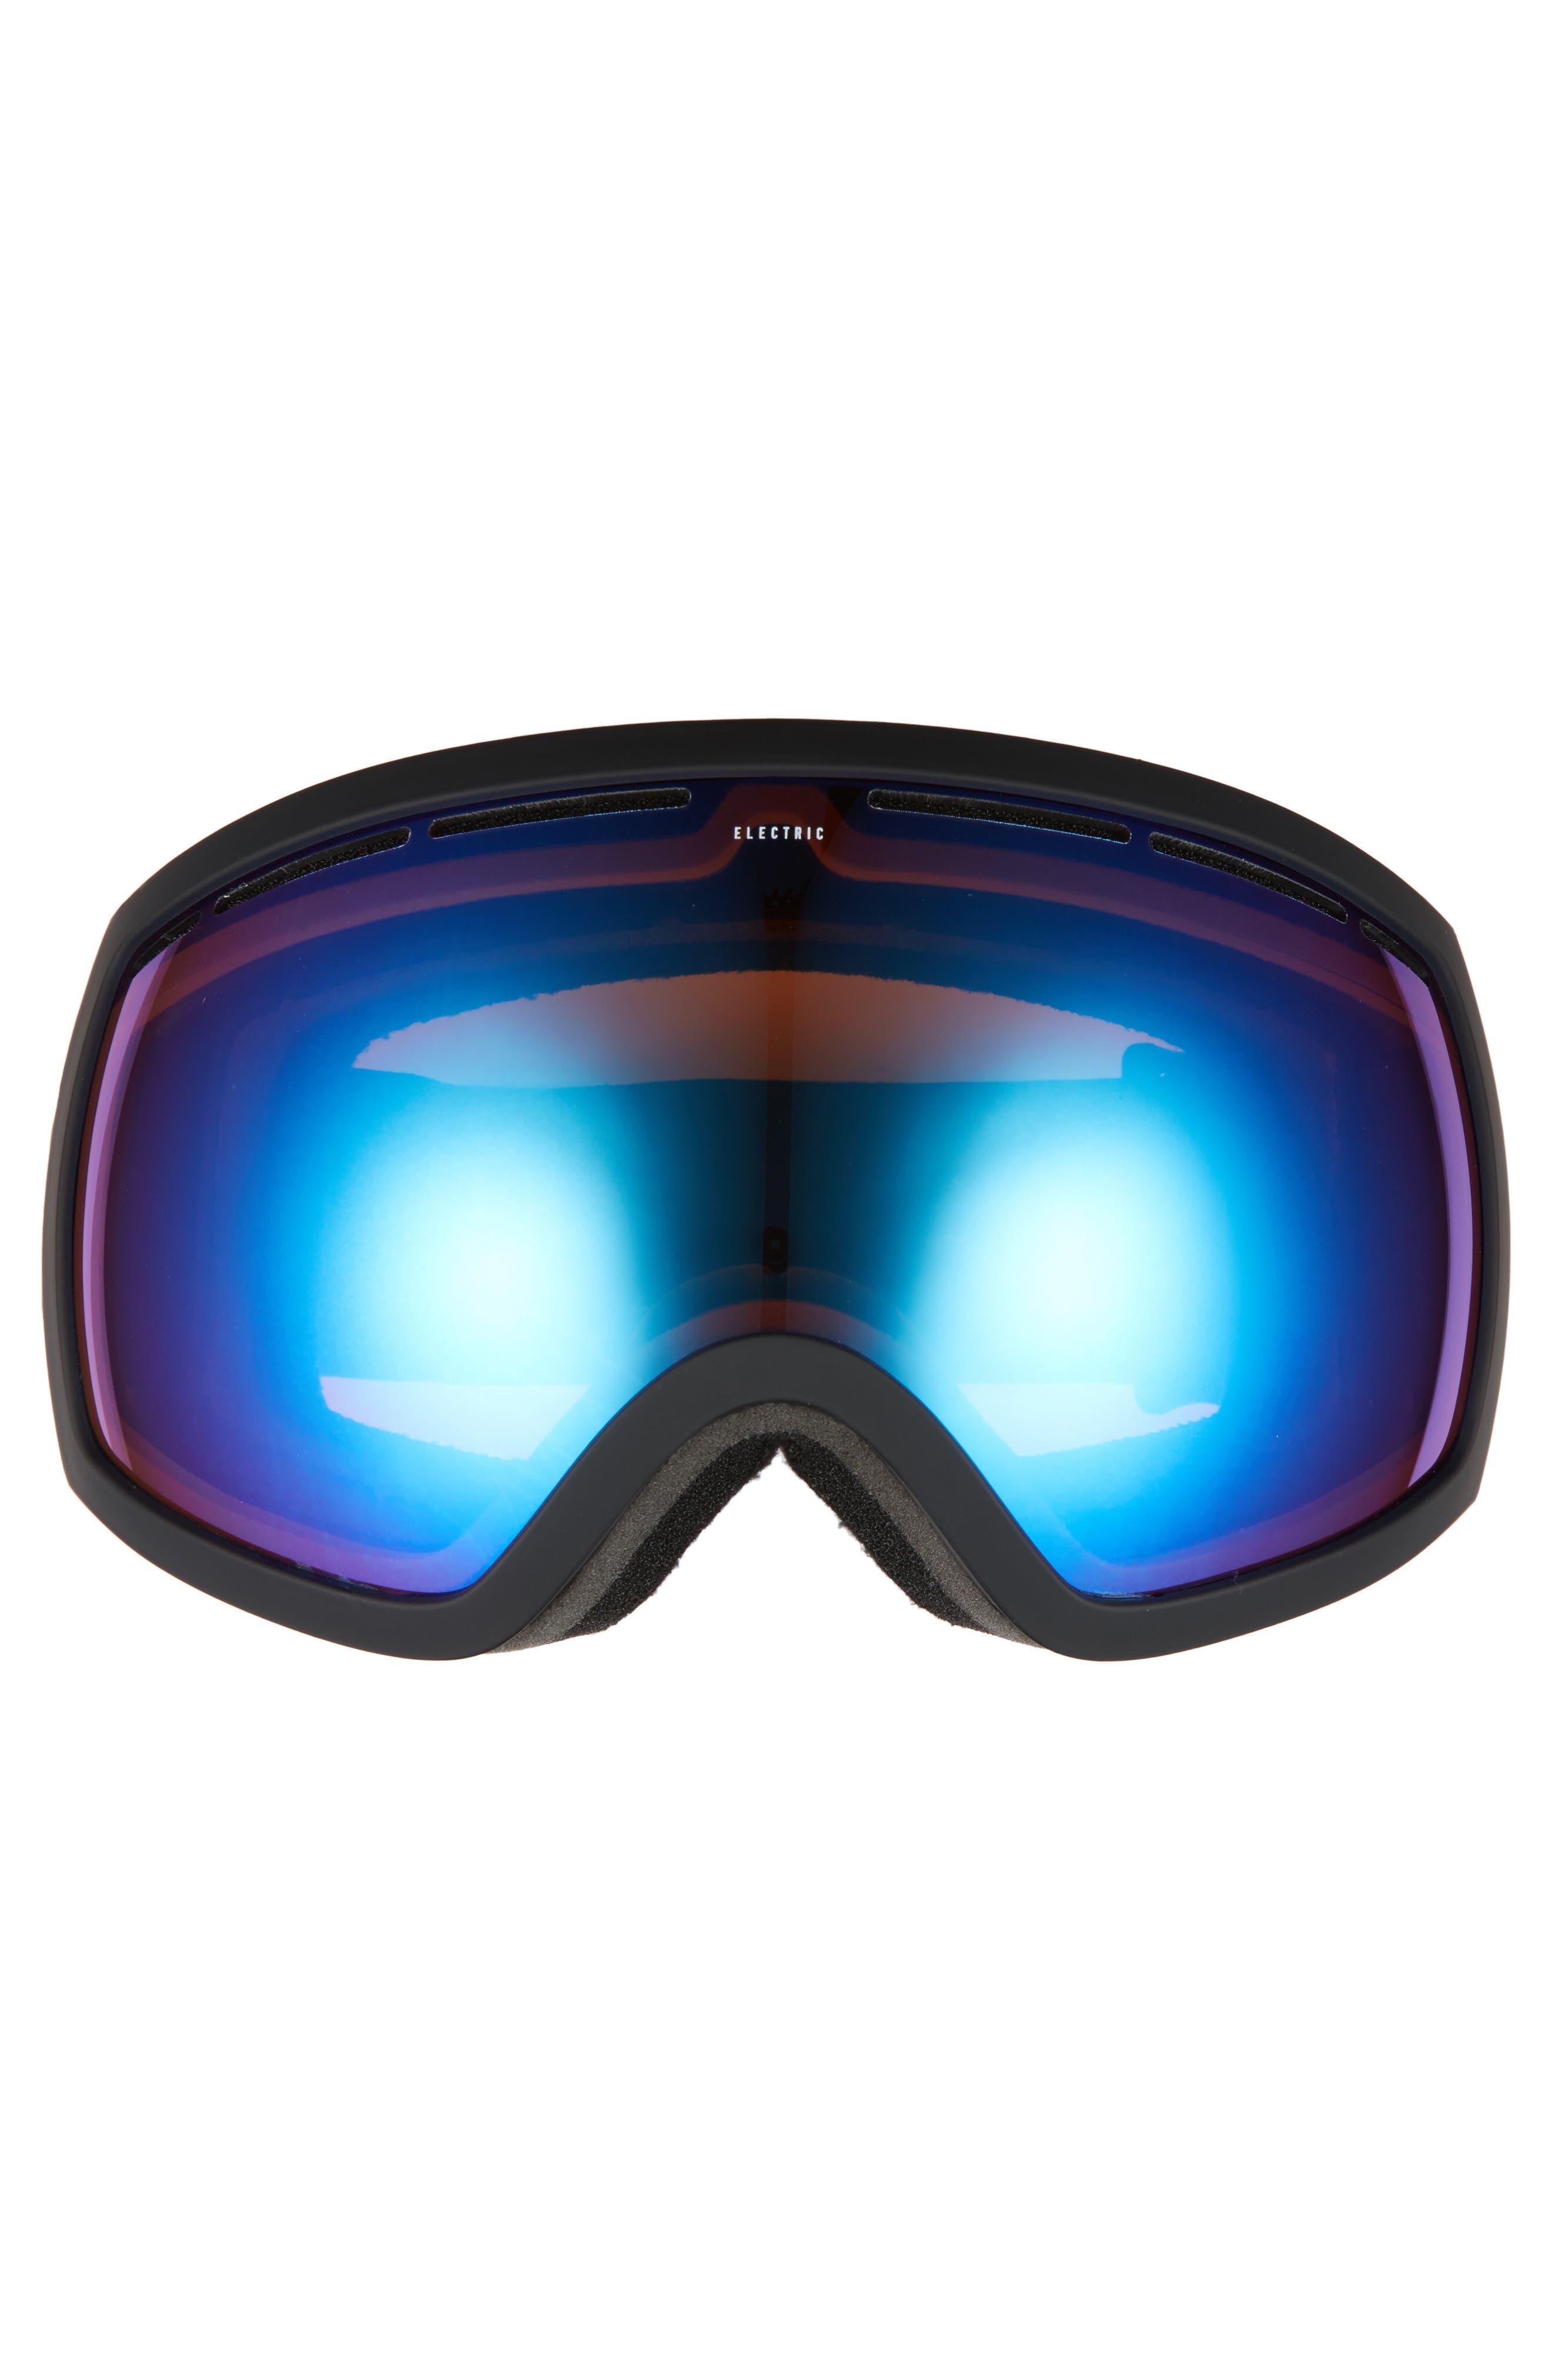 EG2 Snow Goggles,                             Alternate thumbnail 3, color,                             Matte Black/ Blue Chrome